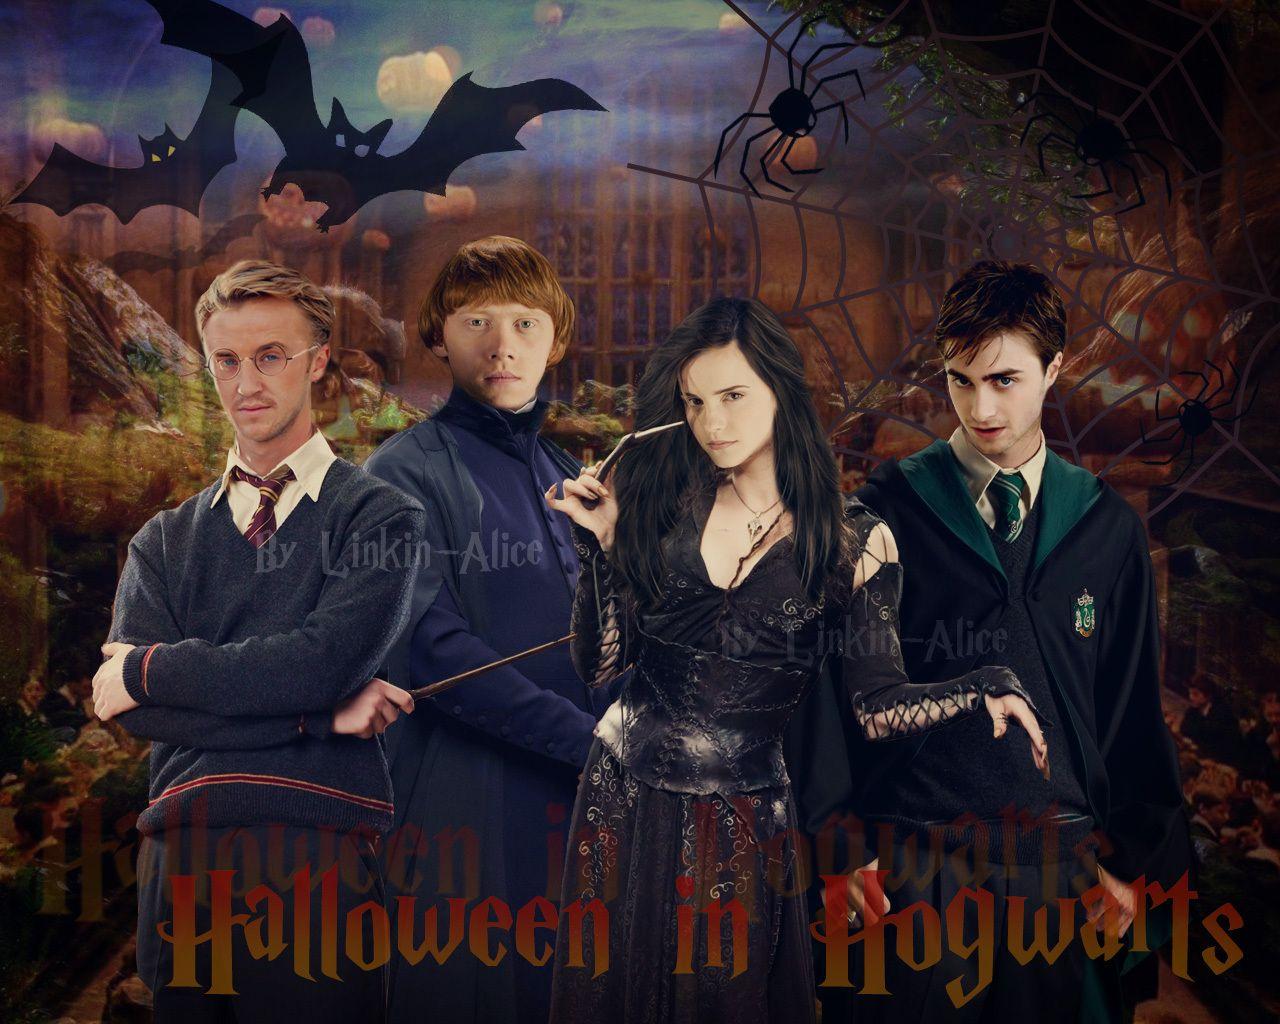 Harry Potter Screensavers For Free Google Search Harry Potter Wallpaper Harry Potter Fan Art Harry Potter